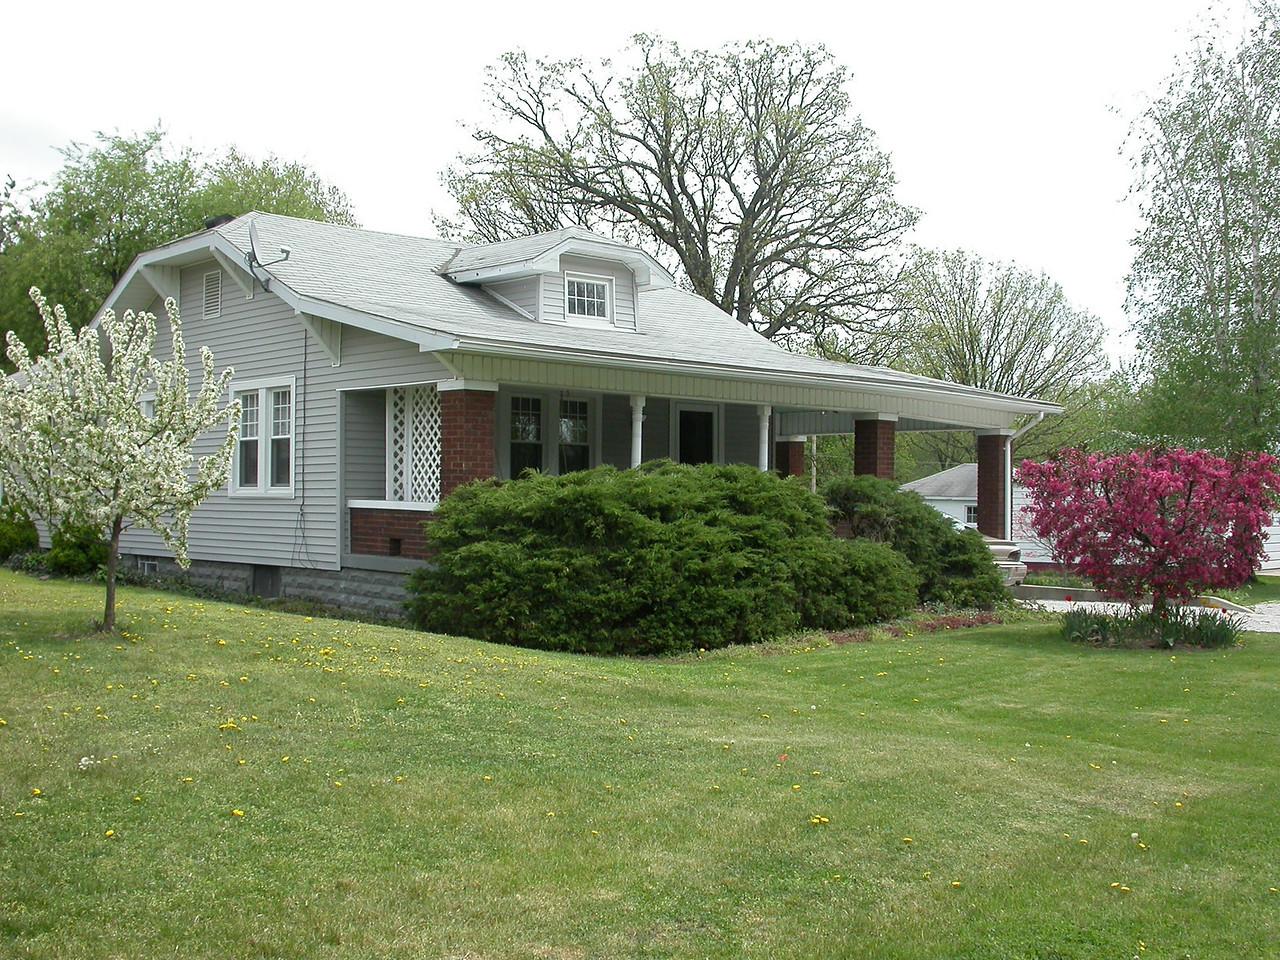 Monty and Phyllis Jones's House, Terre Haute, Indiana